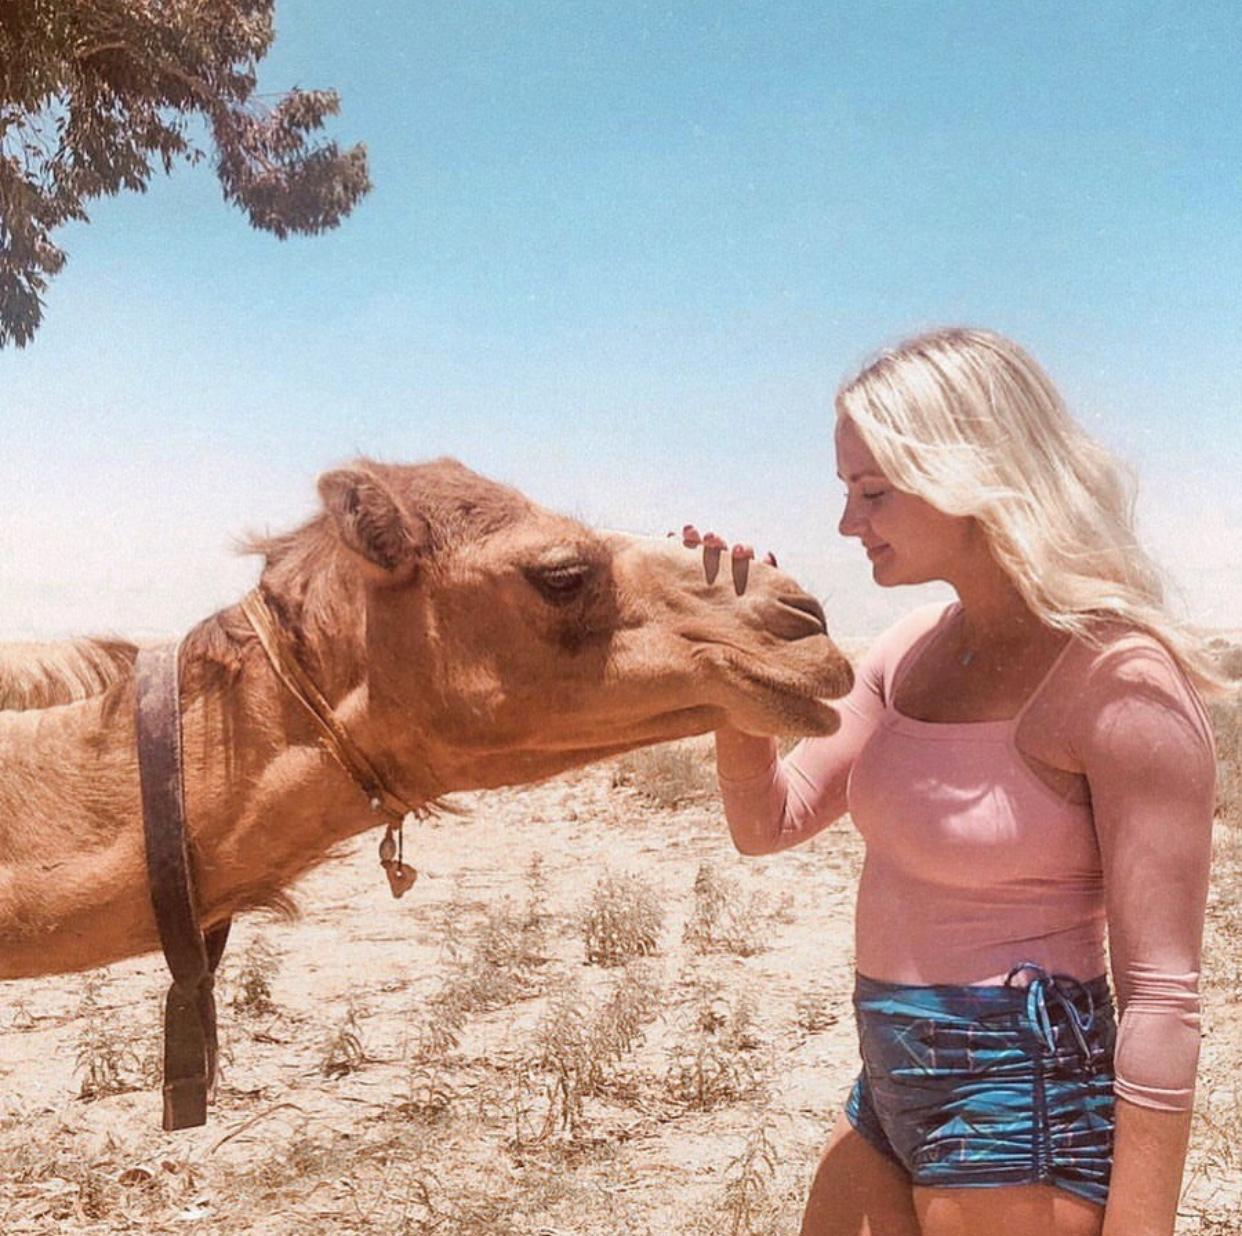 We found a camel in the desert—dream come true!